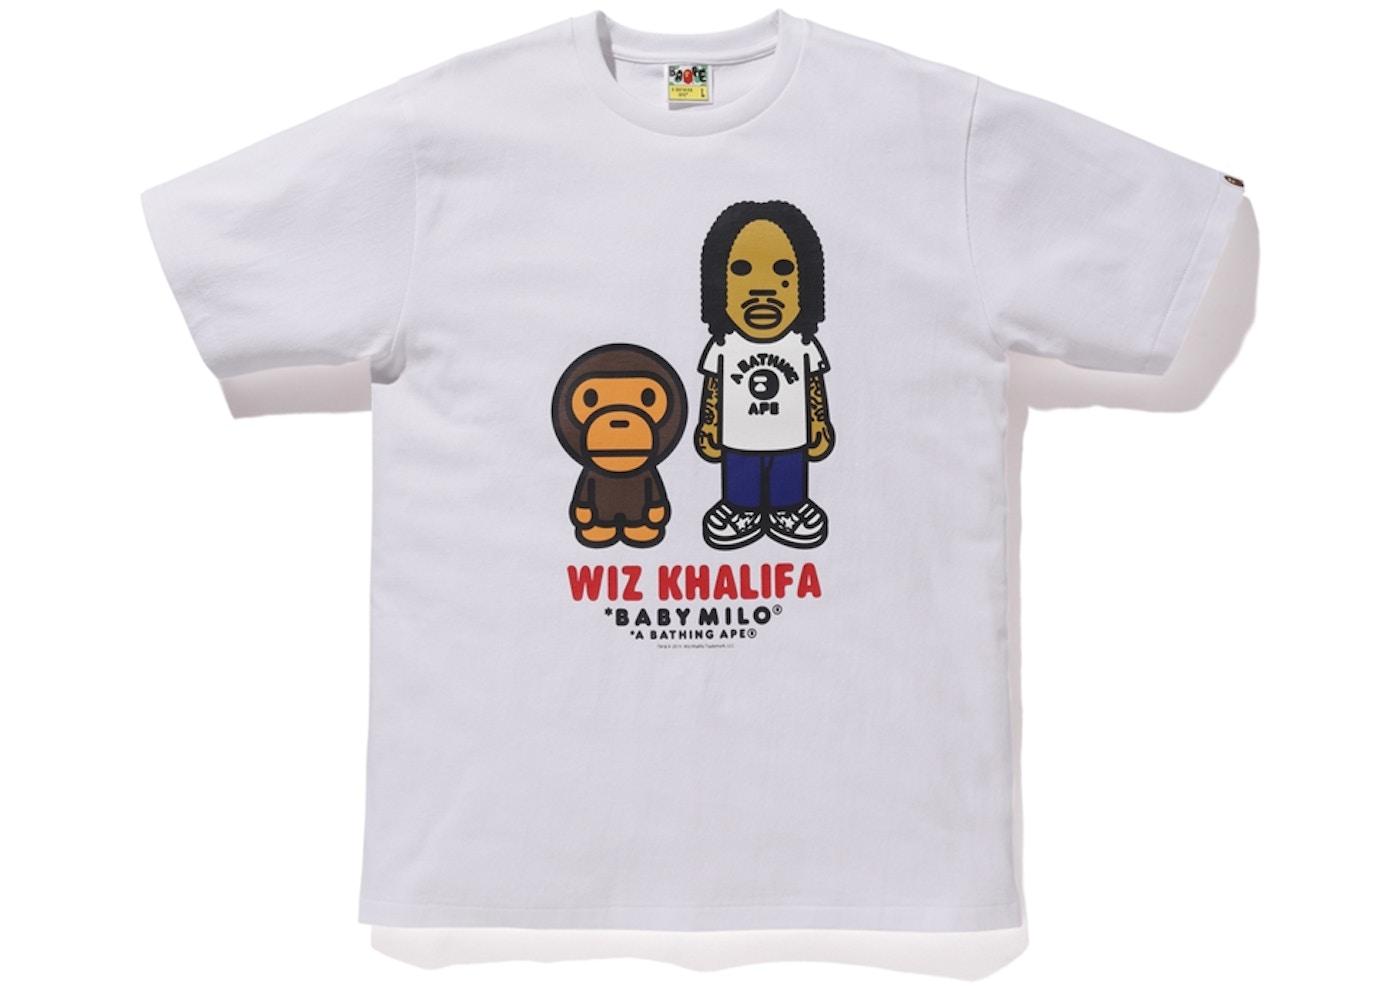 880fc6e9 BAPE Baby Milo x Wiz Khalifa Tee White - FW19